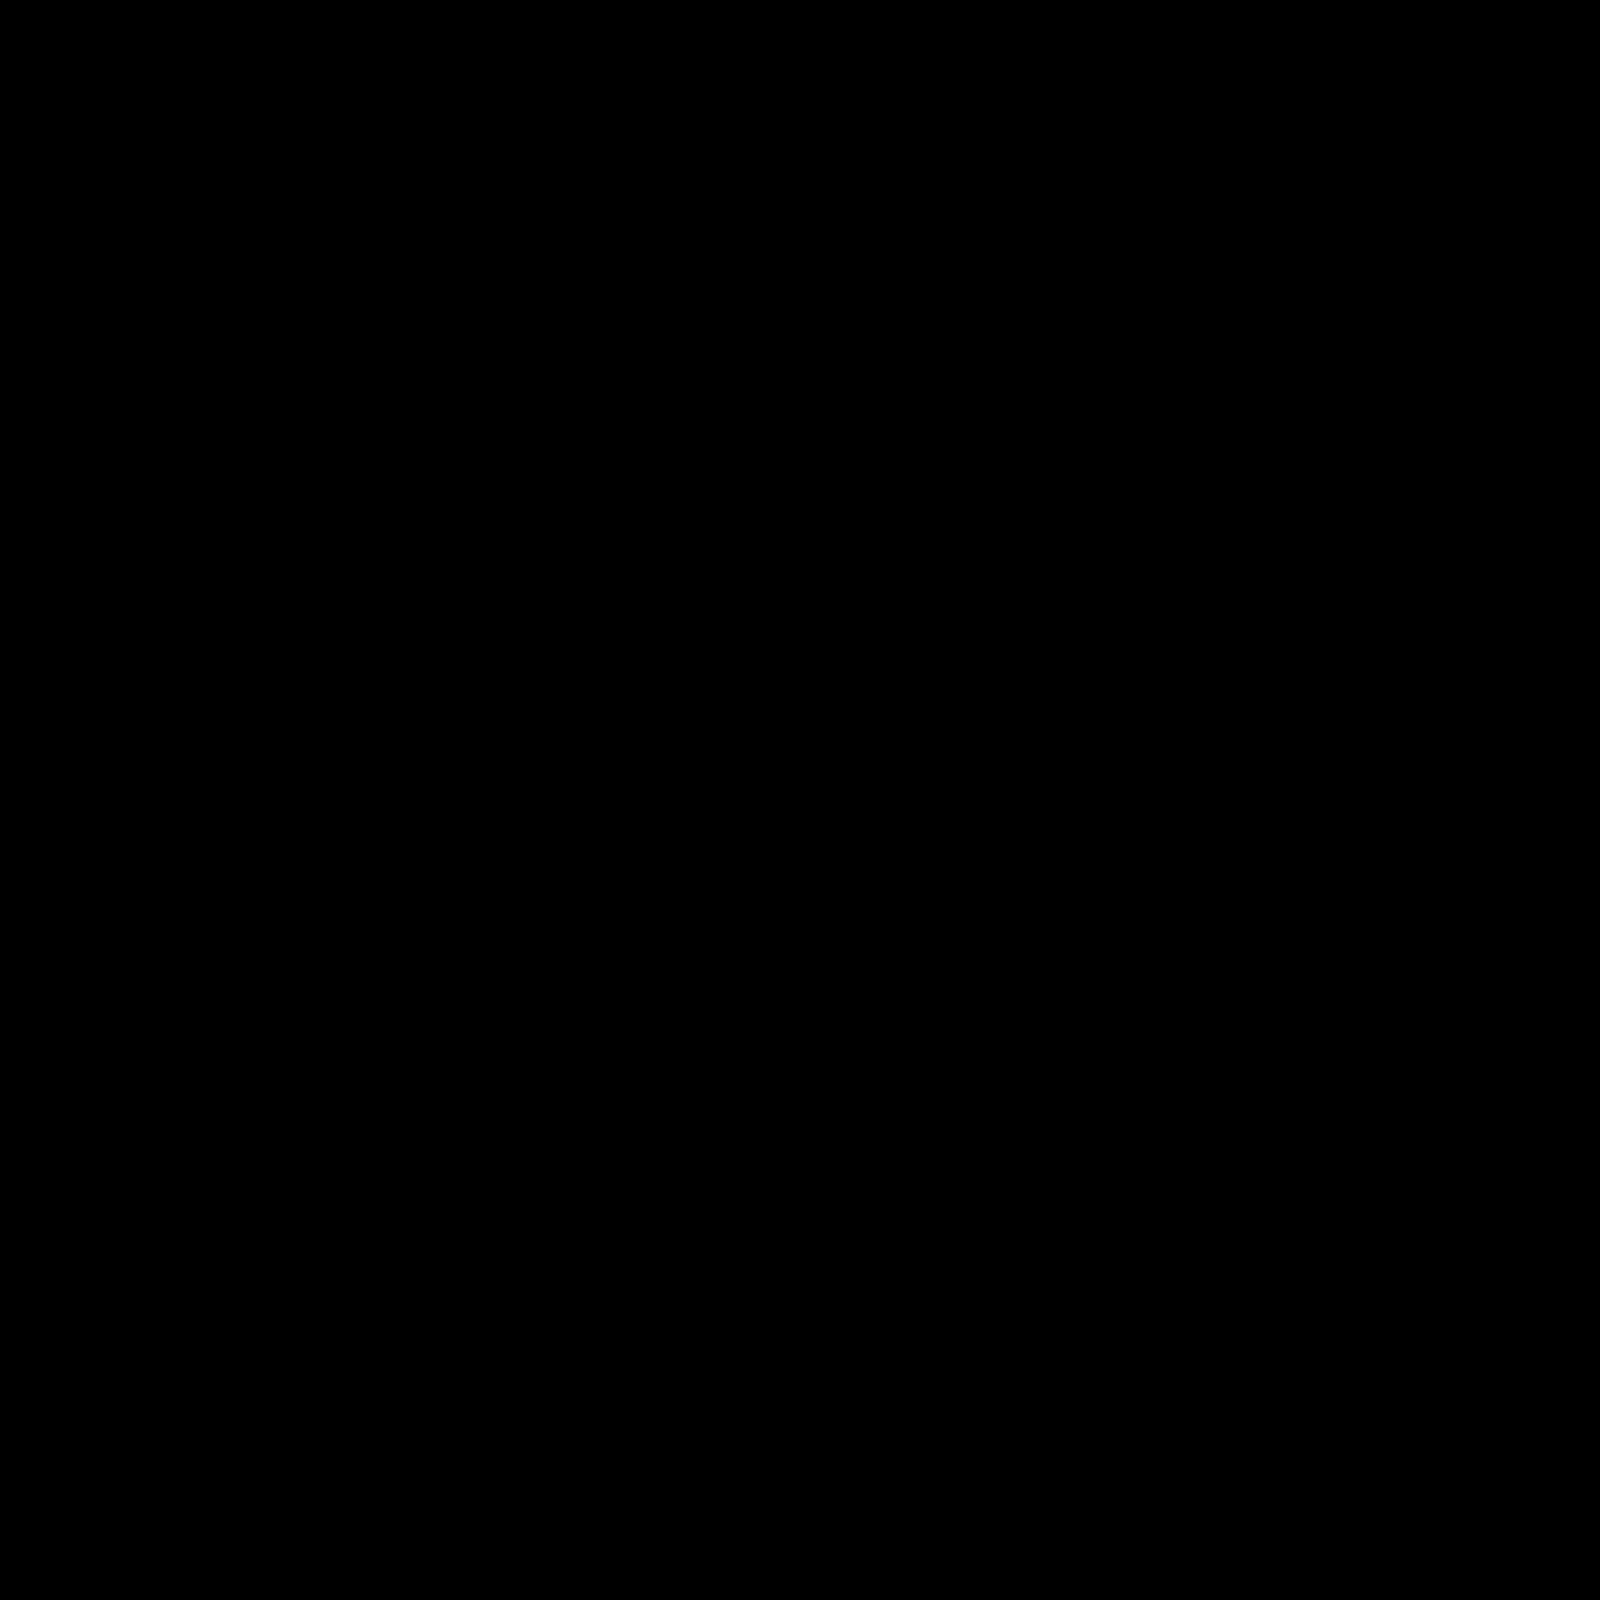 Data od icon